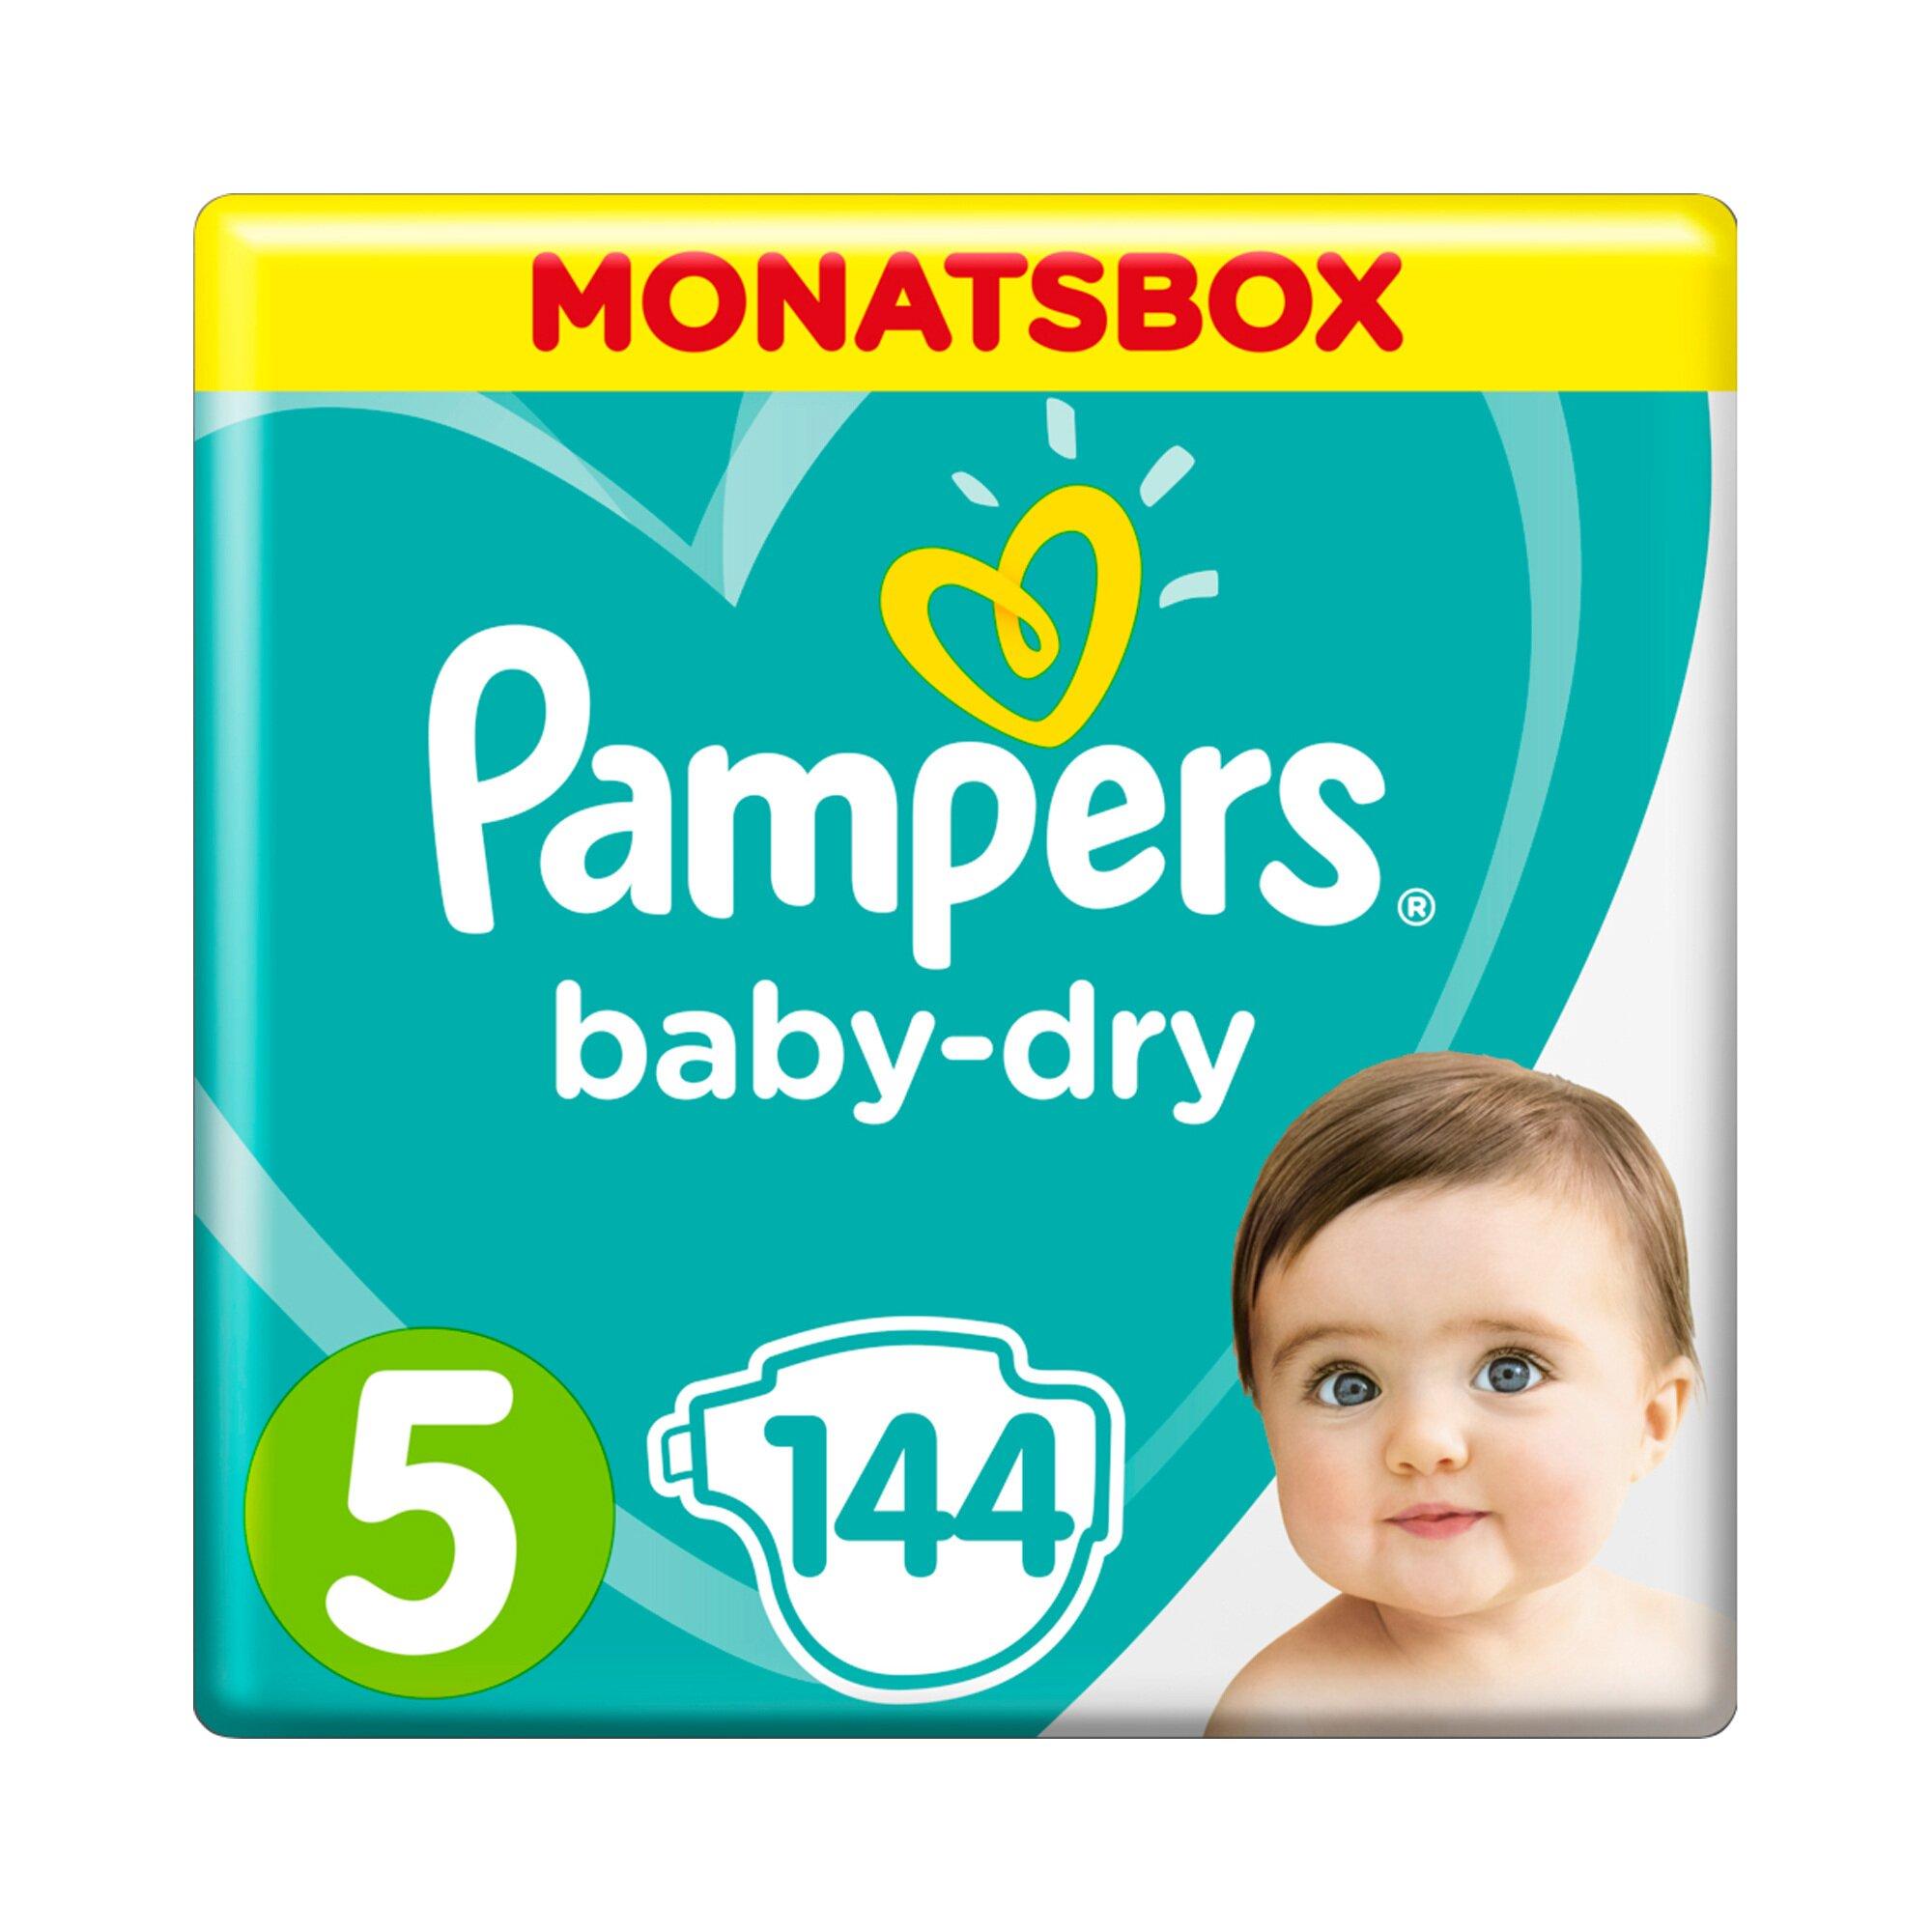 Pampers Baby Dry Windeln Gr. 5 11-16 kg Monatsbox 144 St.